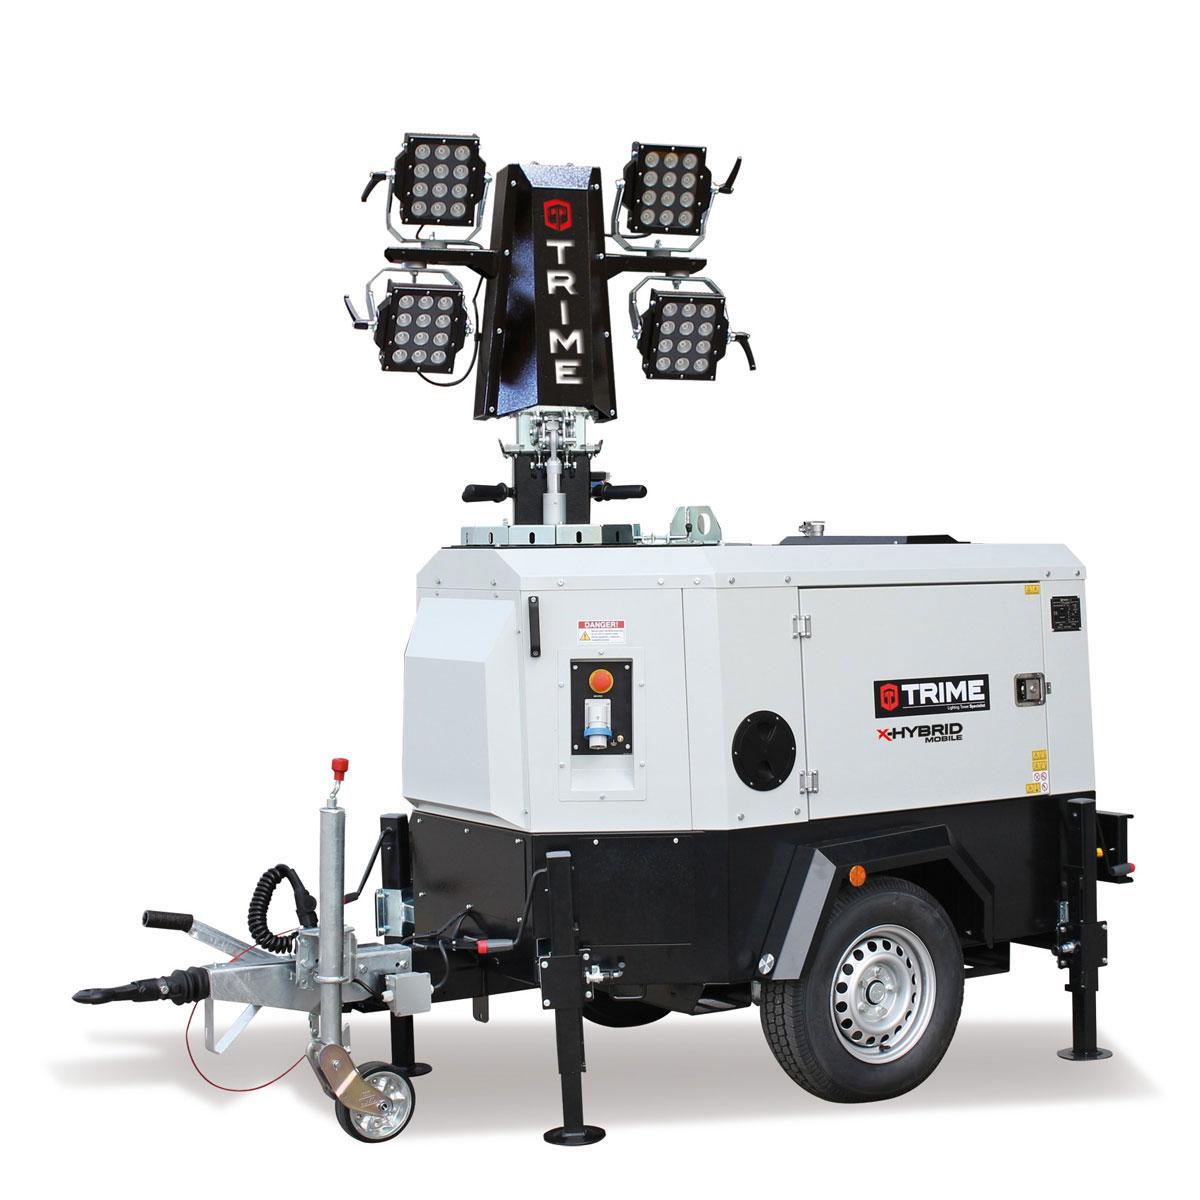 belysningsmast-led-x-hybrid-mobil-4x90W-stangd